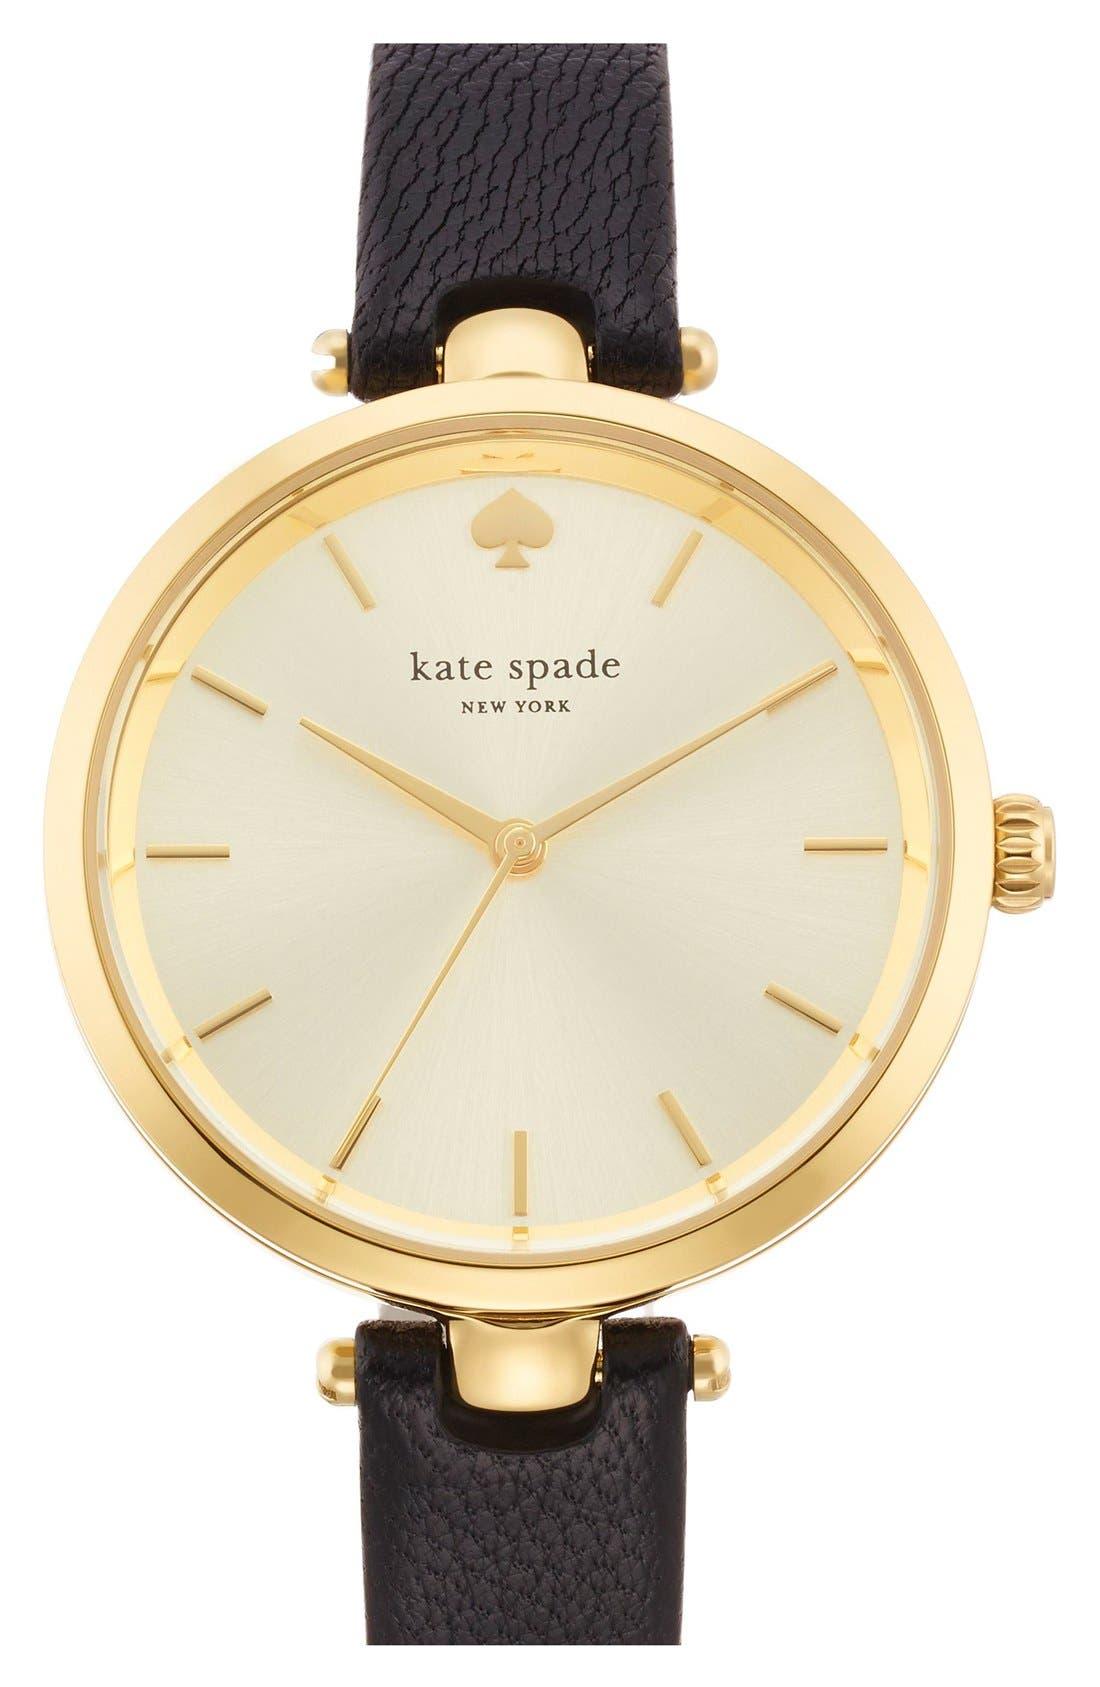 KATE SPADE NEW YORK 'holland' round watch, 34mm